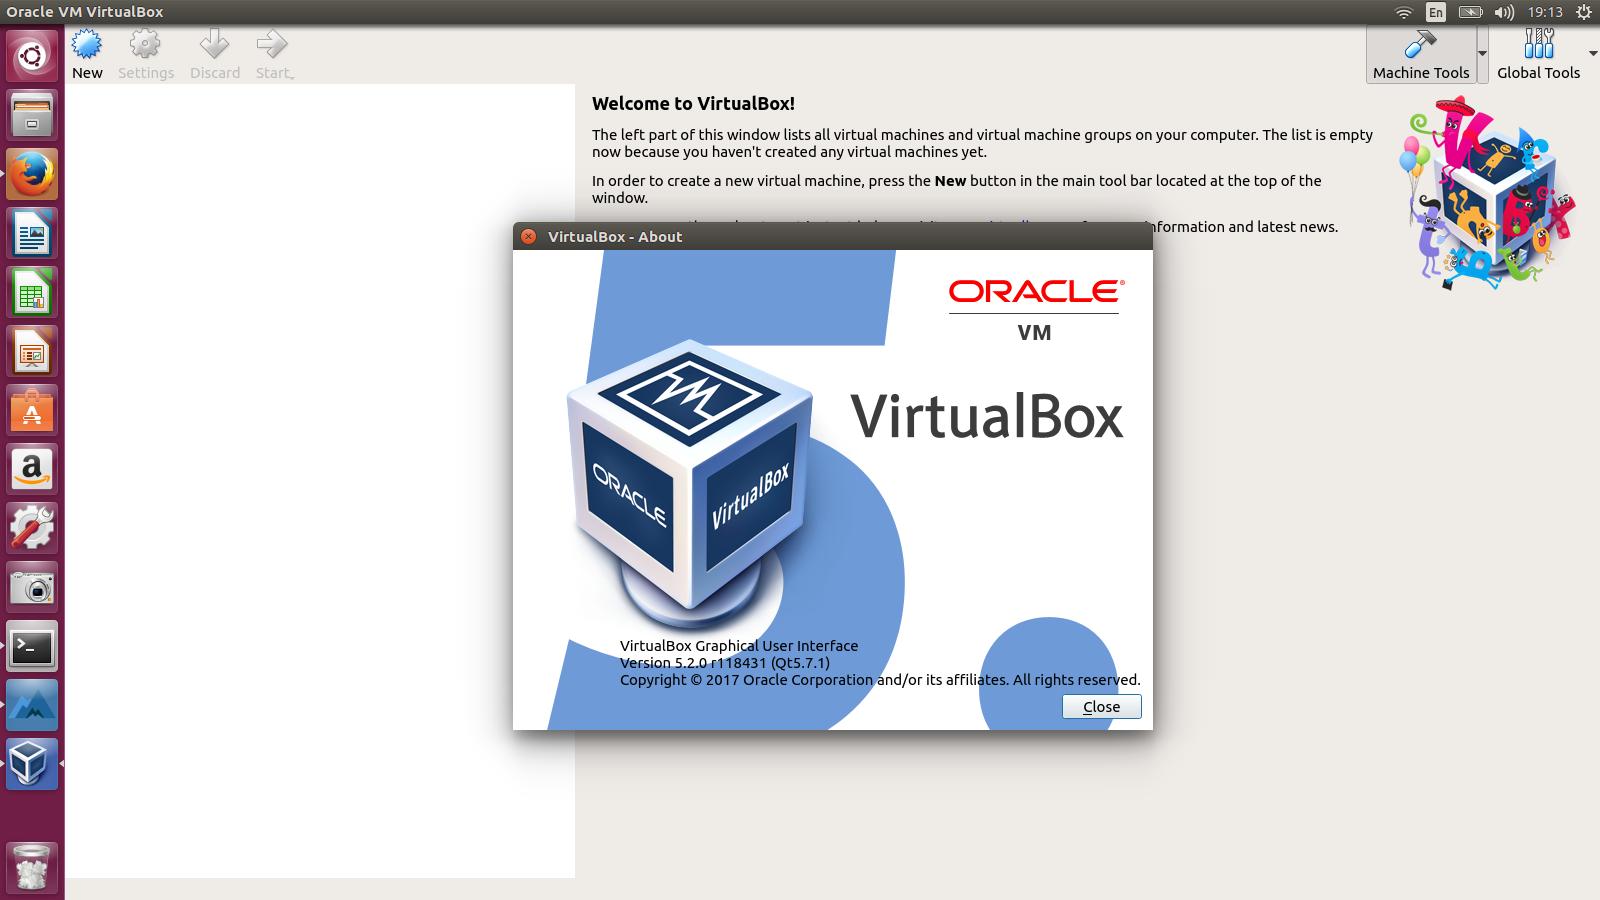 How to install program on Ubuntu: Virtualbox 5 2 0 Released